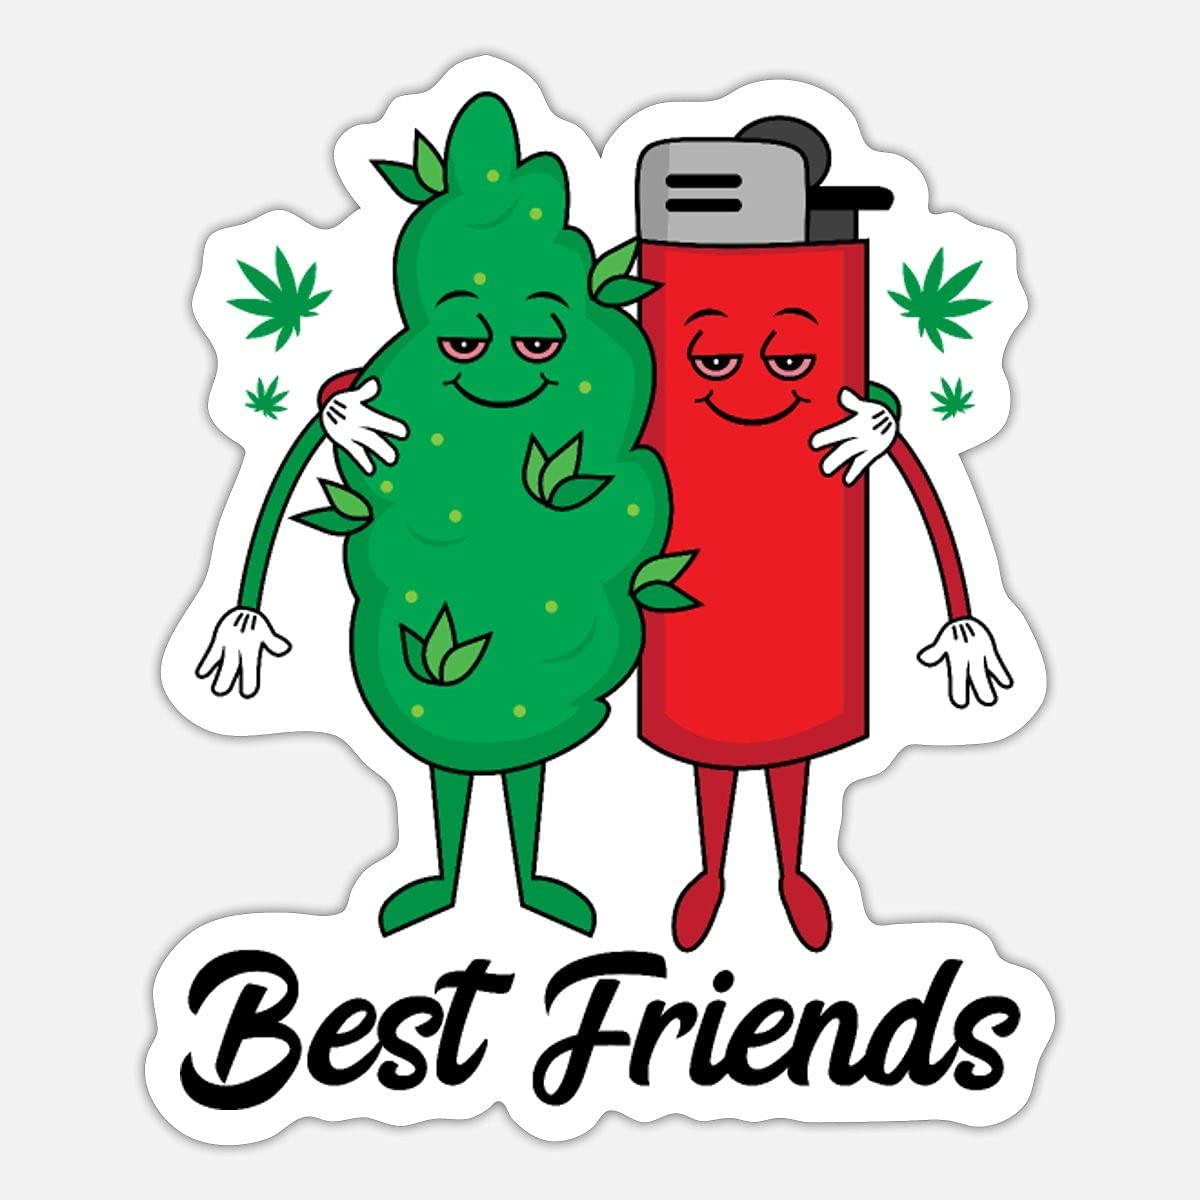 Best Friends  Great interest Funny Sticker Vinyl Phone Bottle Laptop Max 67% OFF for Water